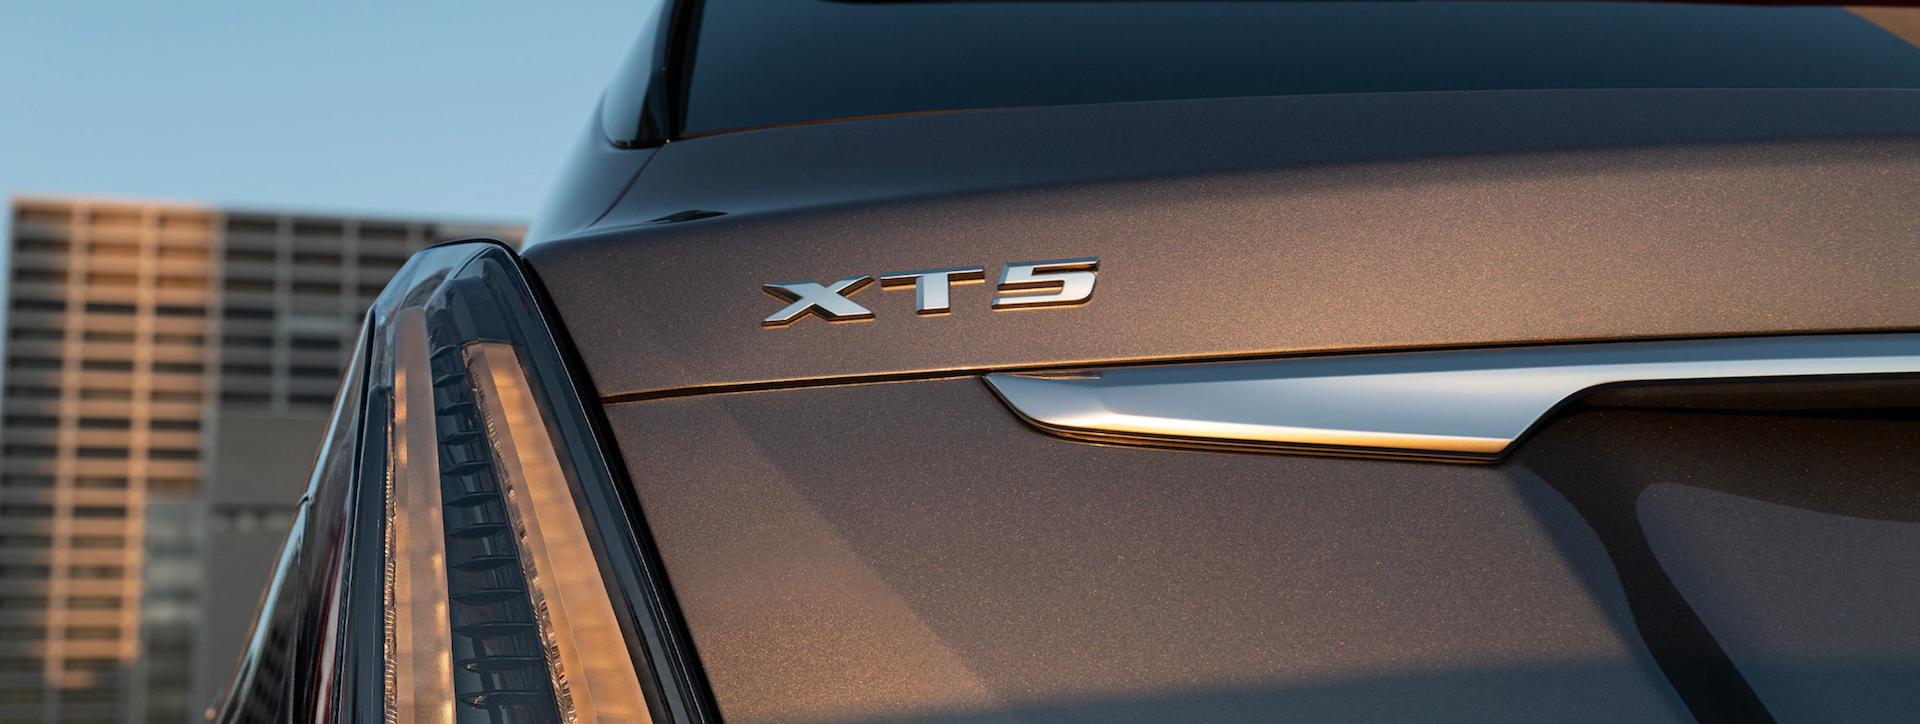 Rear view of 2021 Cadillac XT5 SUV near you.